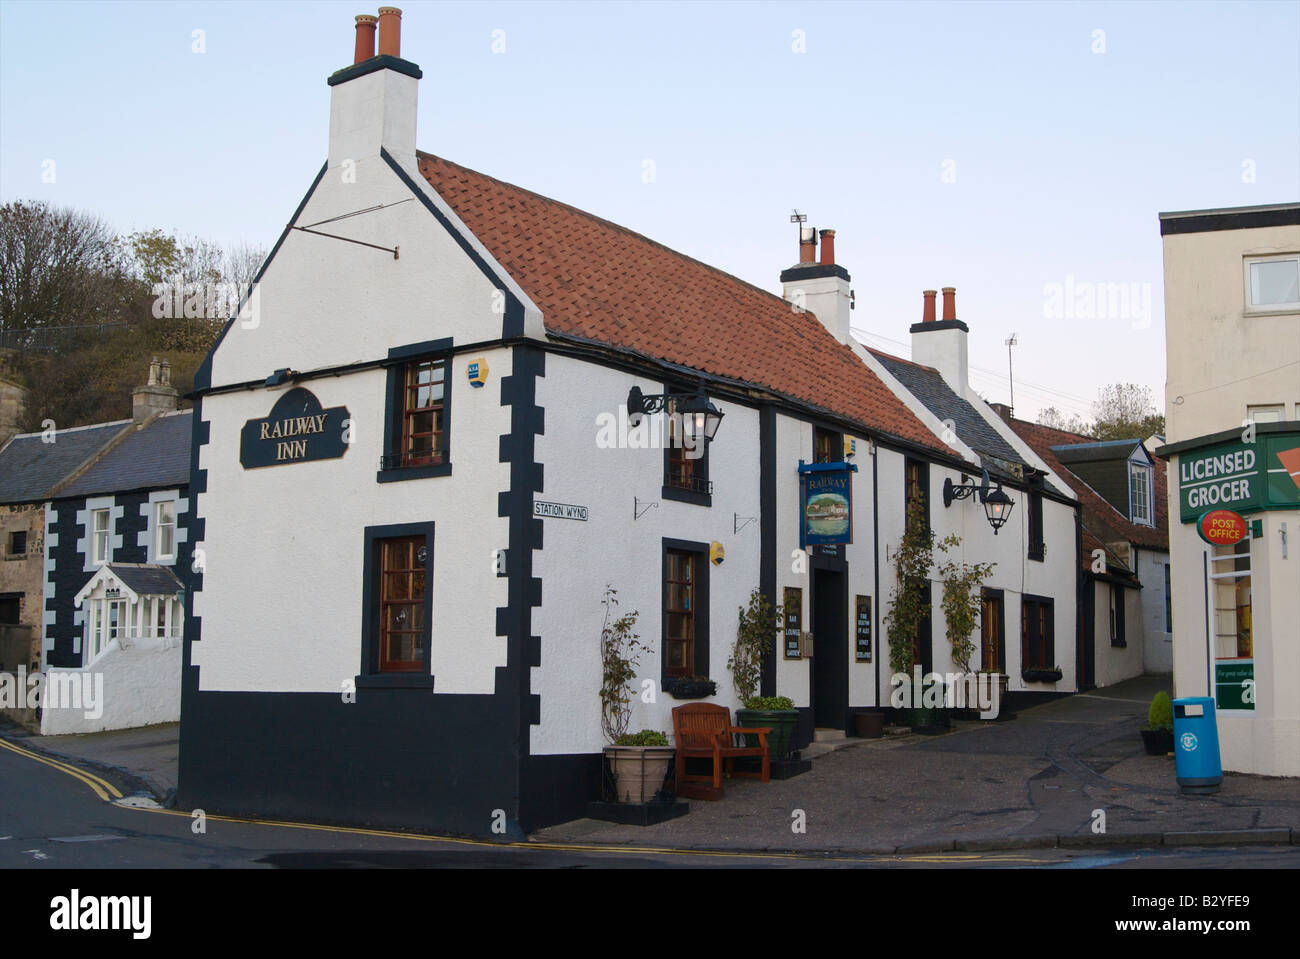 The Railway Inn at Lower Largo in the East Neuk of Fife. - Stock Image